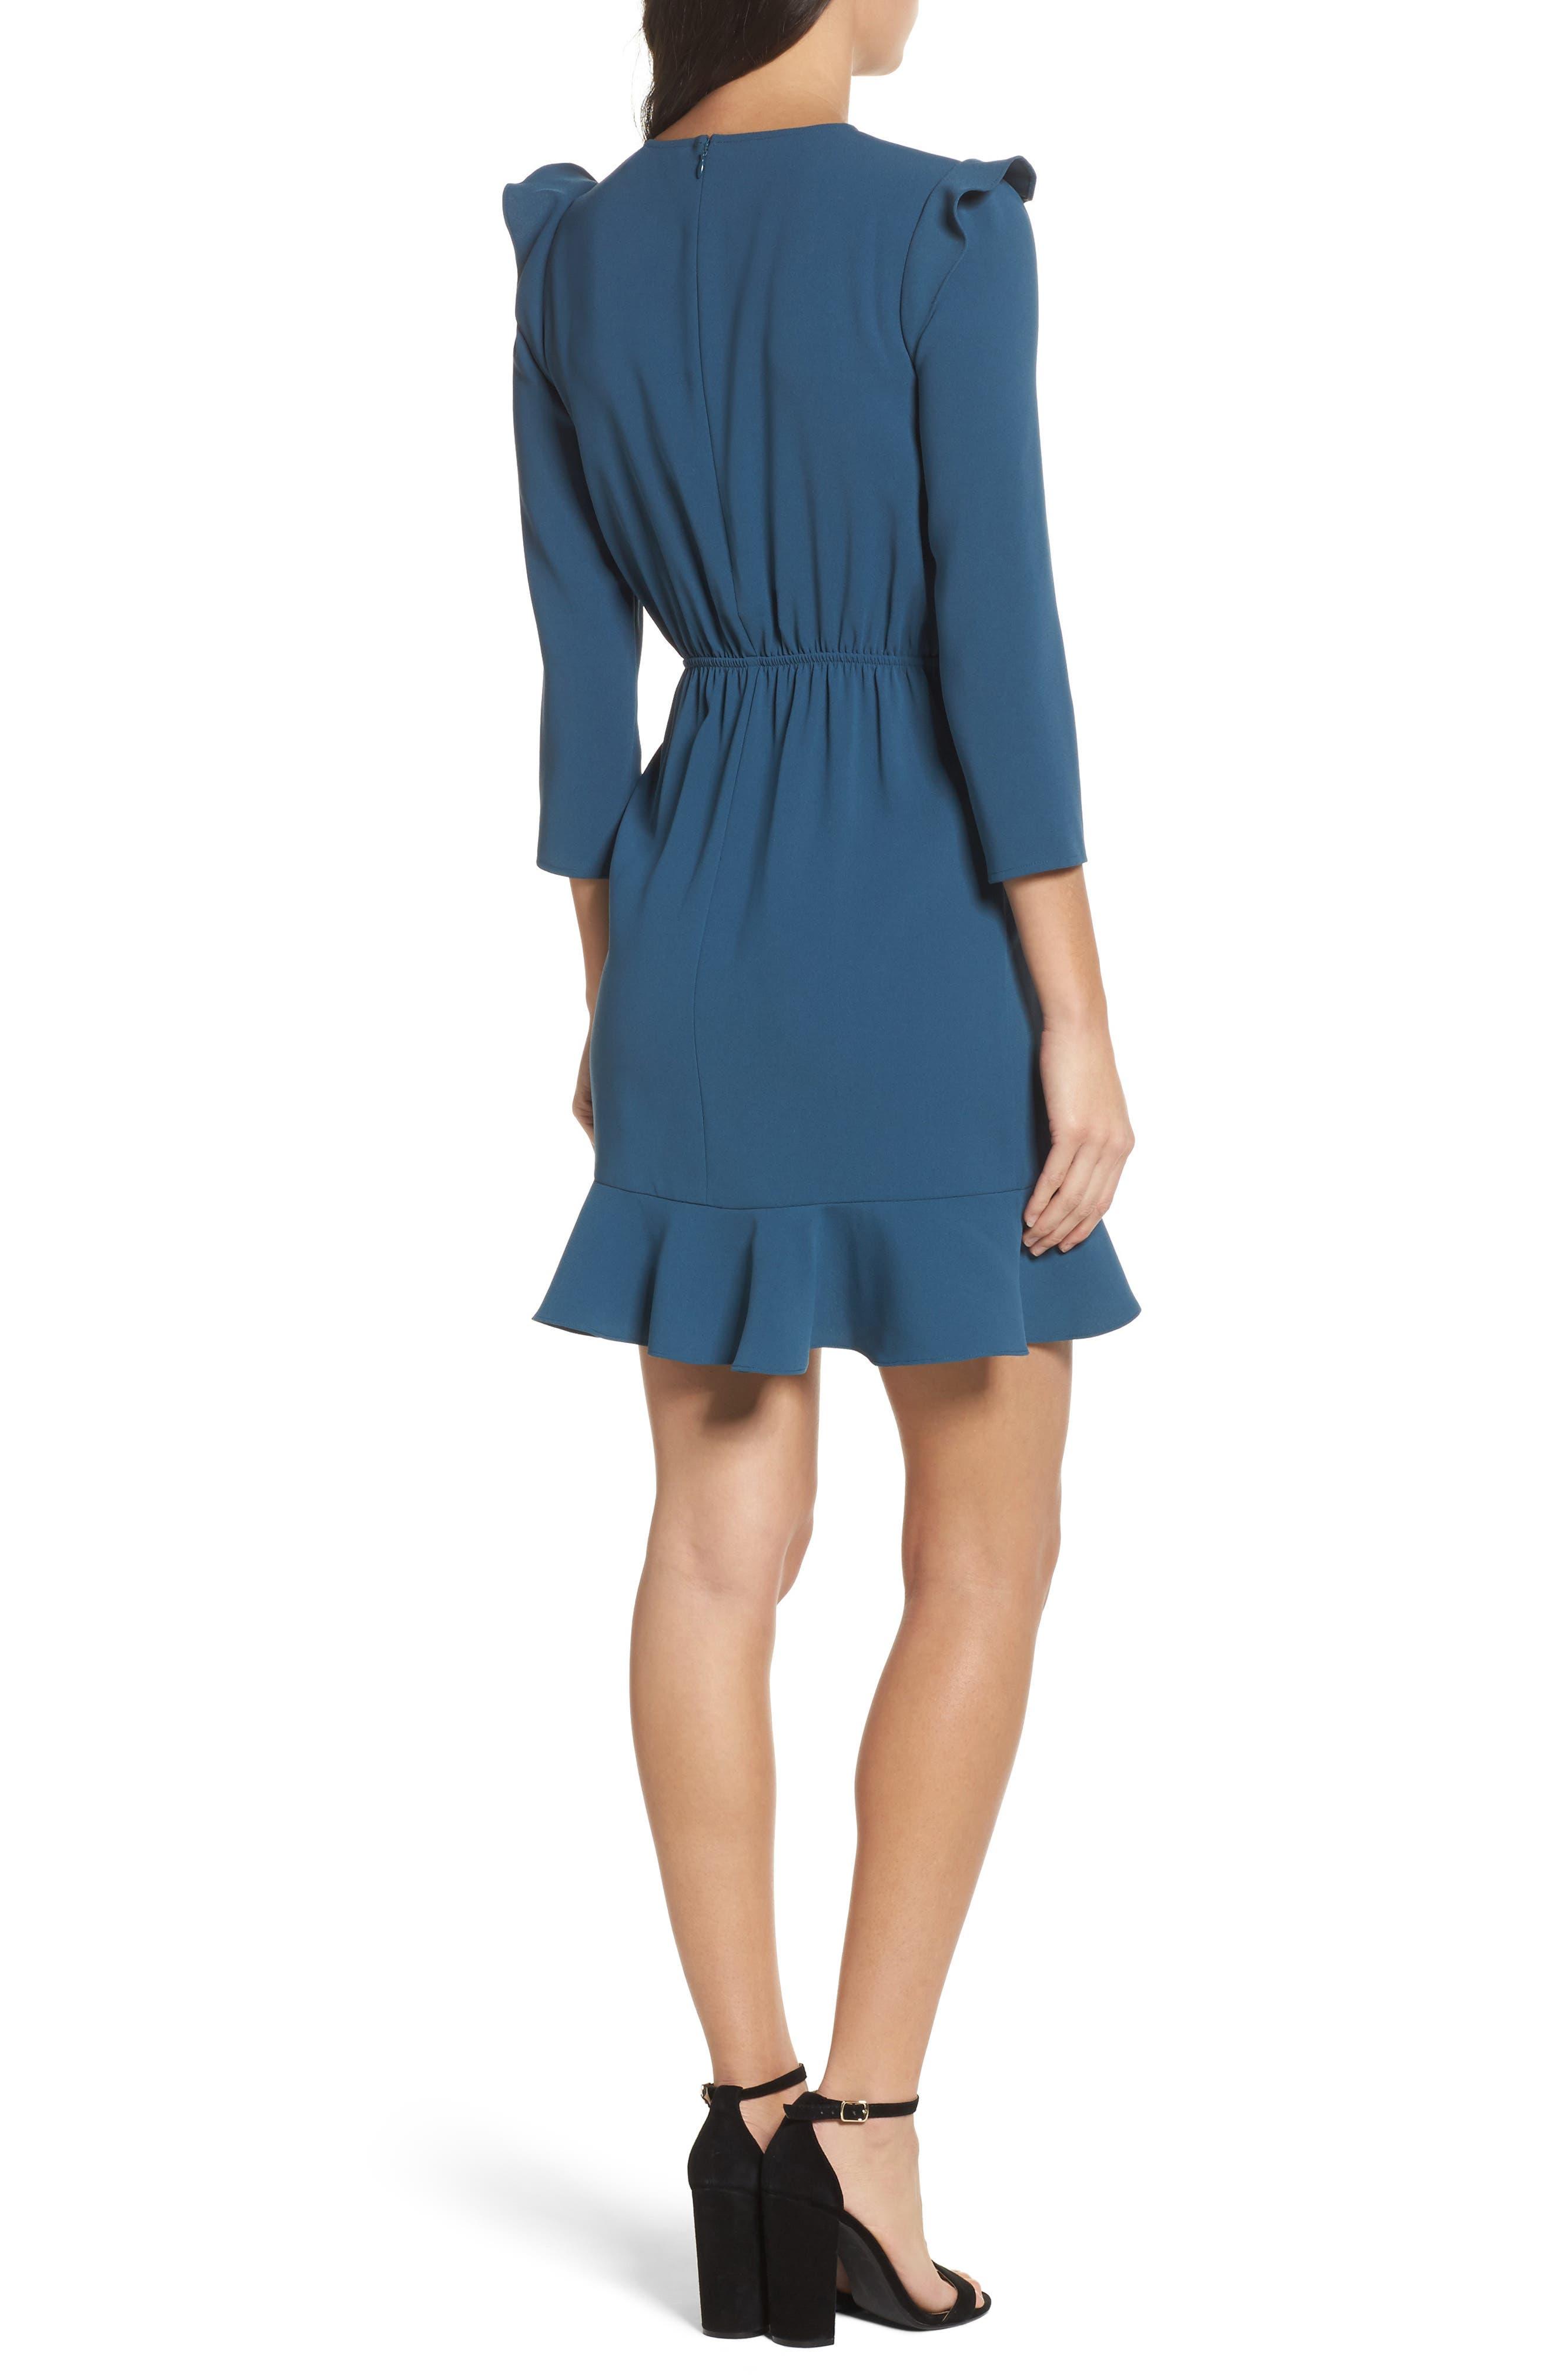 St Germain Ruffle Fit & Flare Dress,                             Alternate thumbnail 4, color,